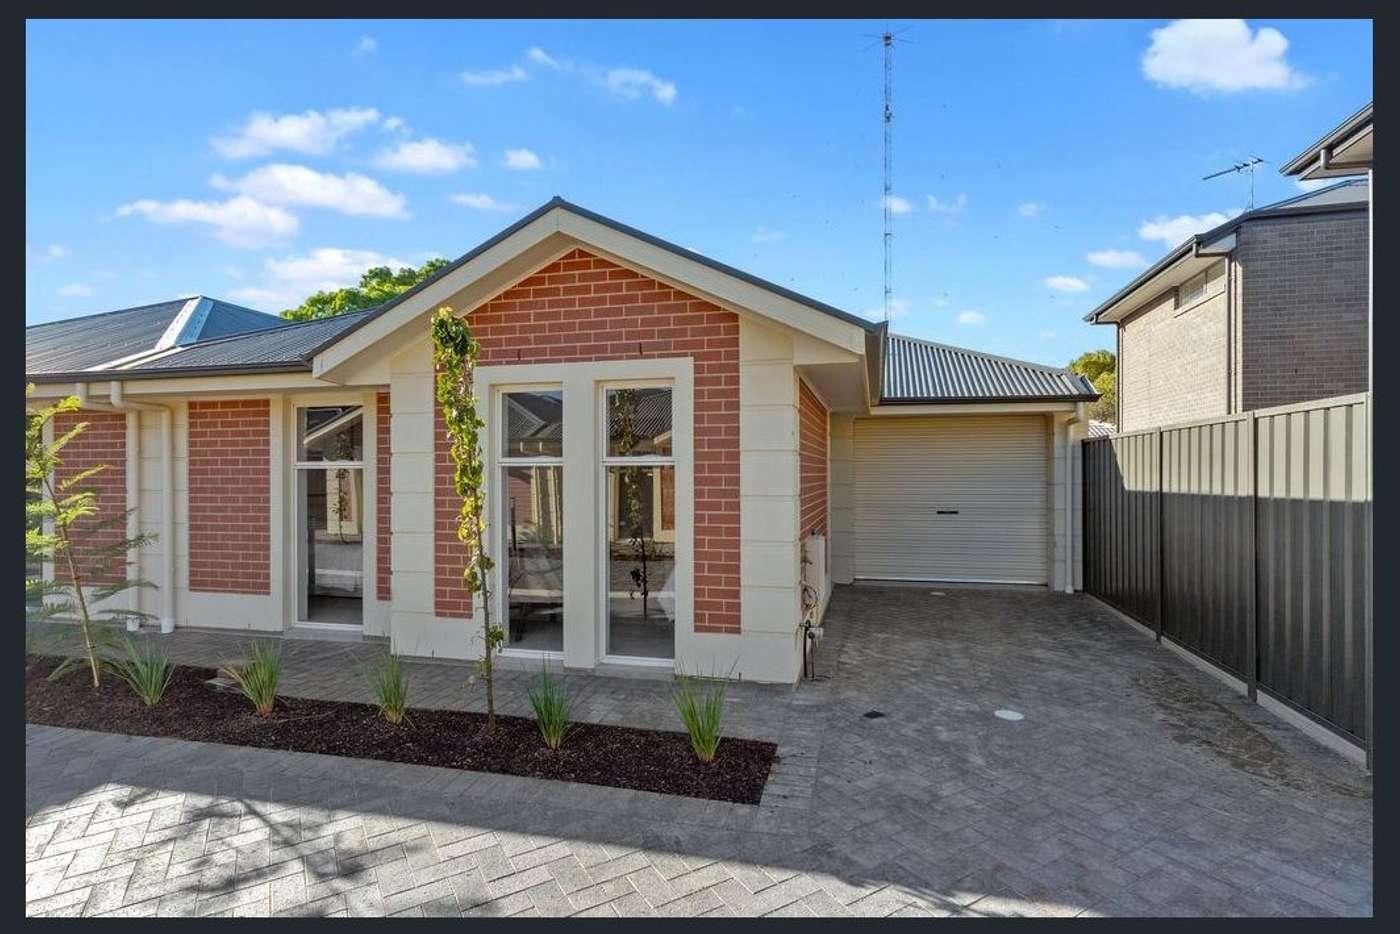 Main view of Homely house listing, 5/24 Grazing Avenue, Morphett Vale SA 5162